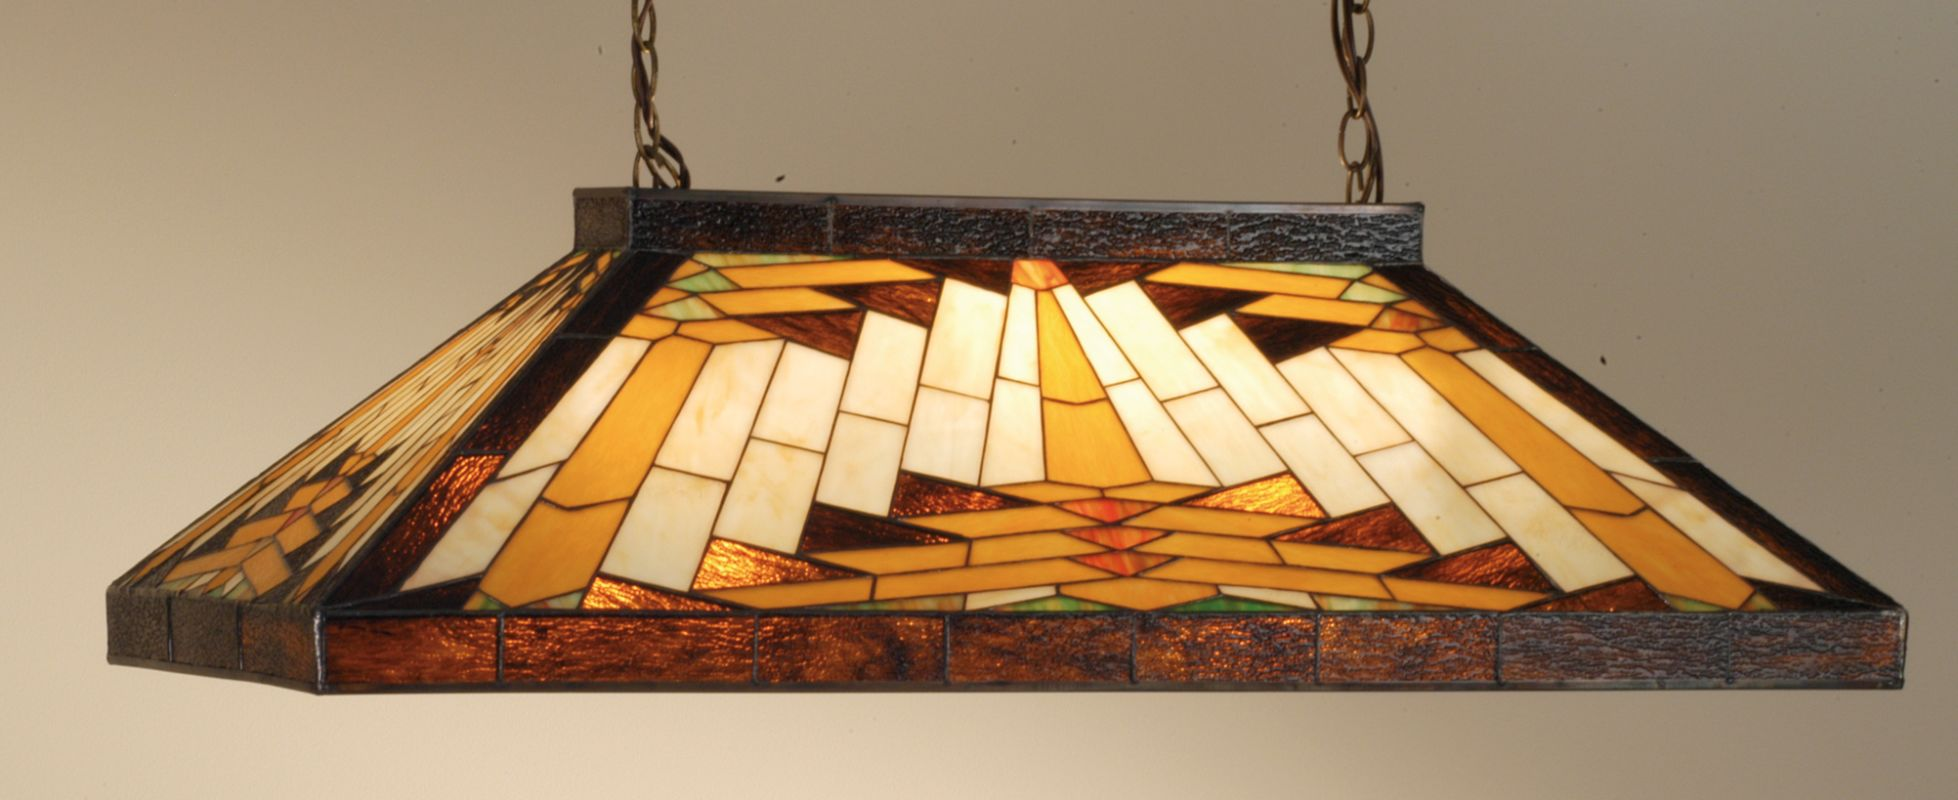 Meyda Tiffany 66677 Stained Glass / Tiffany Island / Billiard Fixture